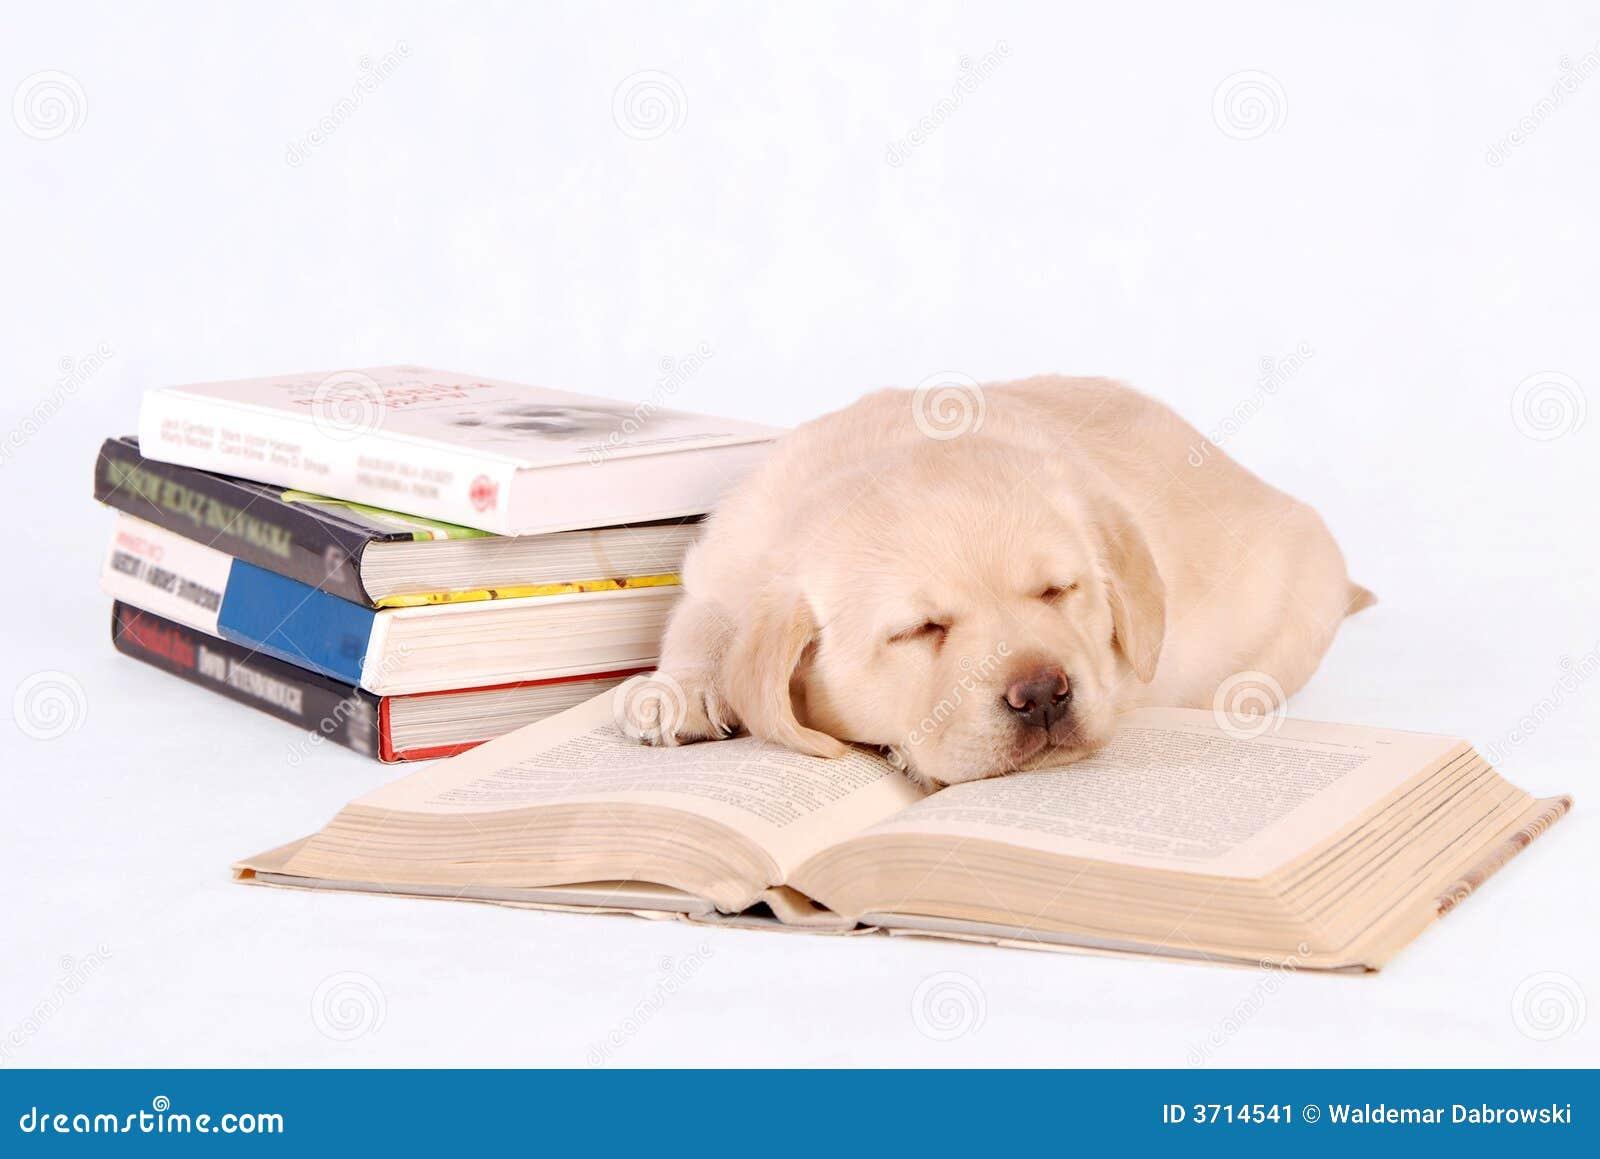 Sleeping Labrador Puppy with books